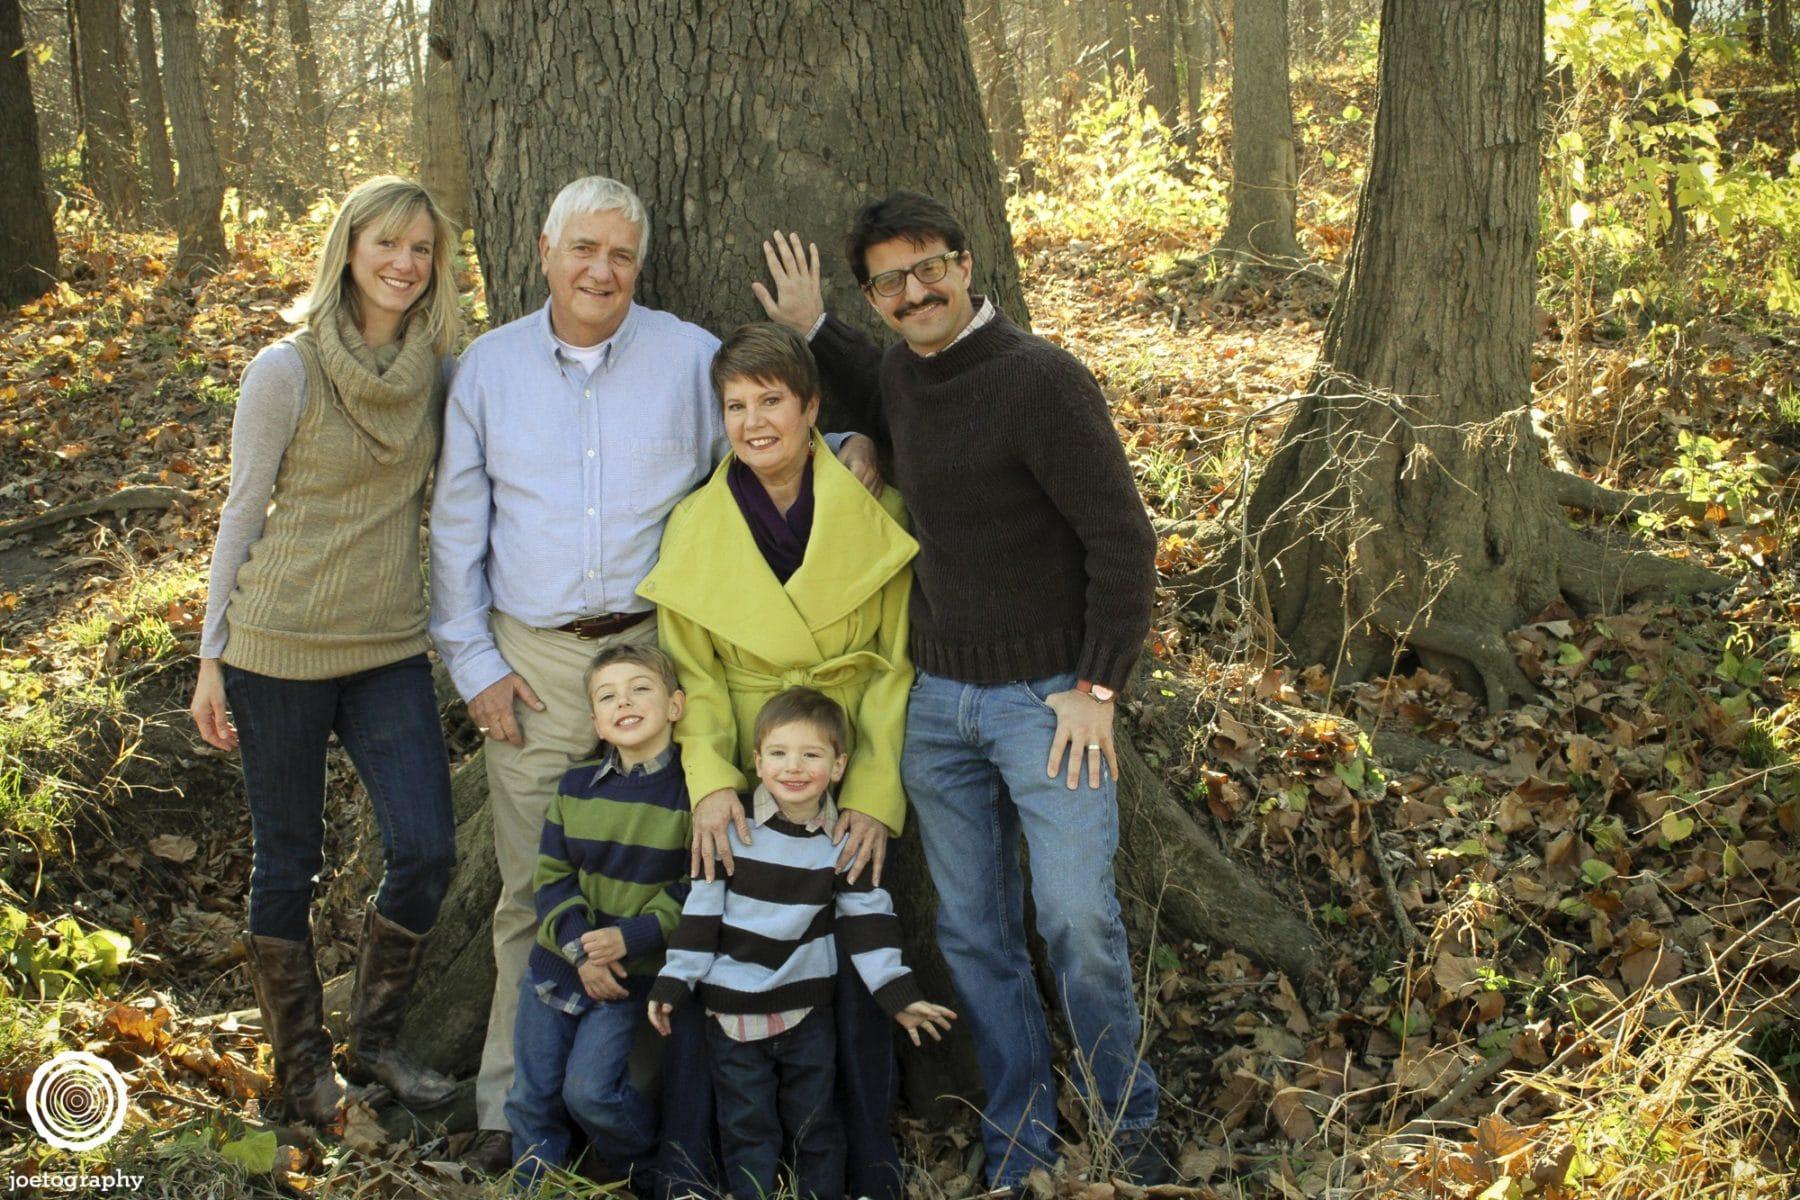 Kenley-Family-Photography-Noblesville-Indiana-52